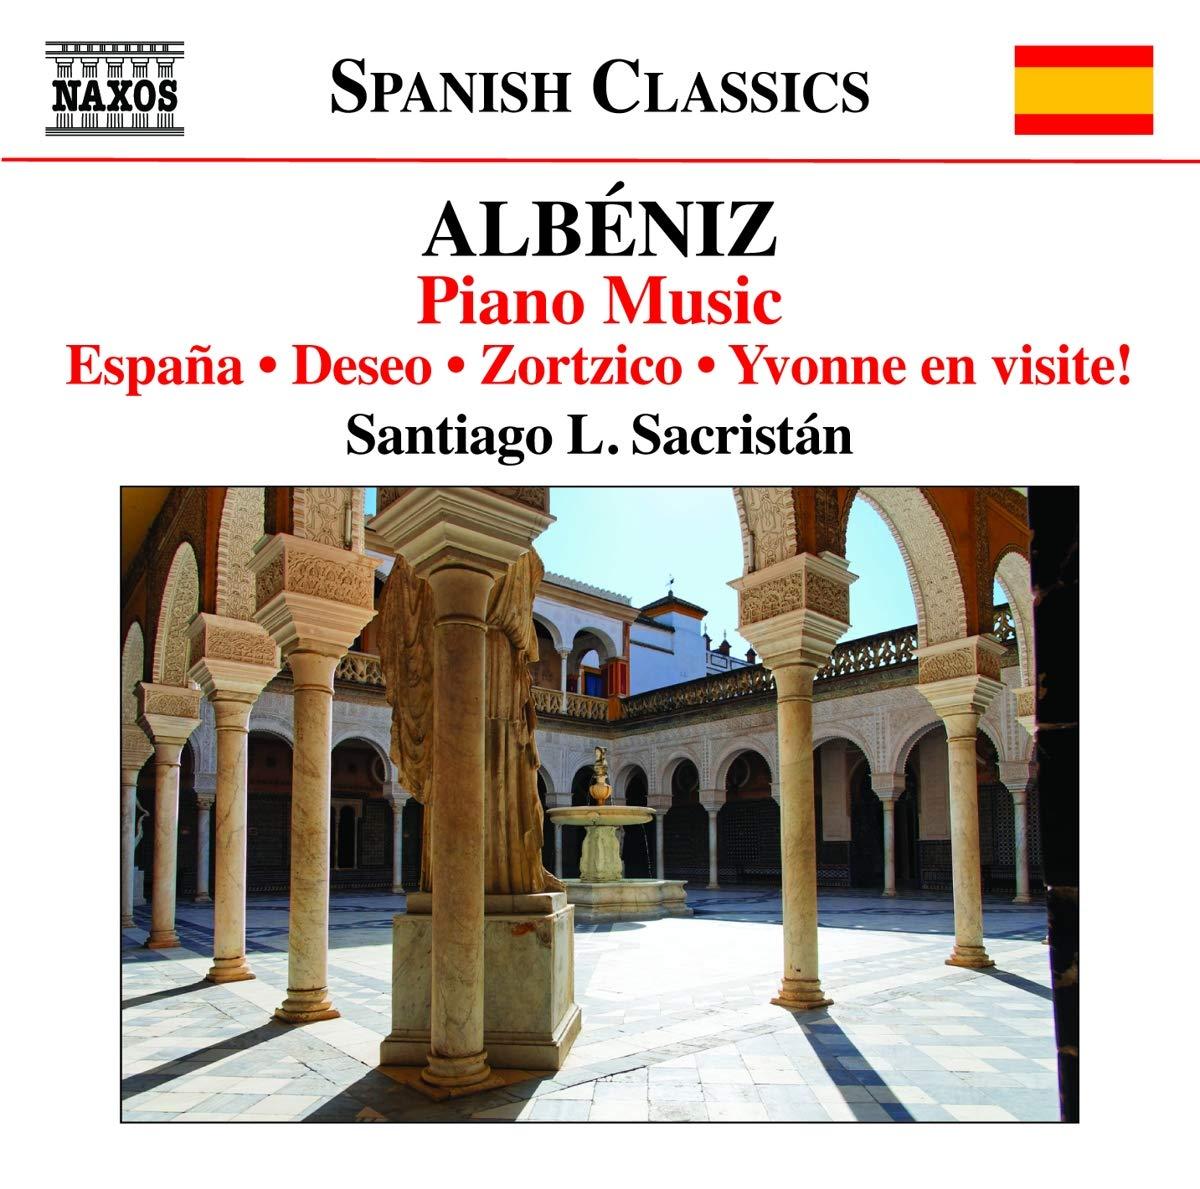 Piano Music Vol.6: Isaac Albeniz, Santiago L. Sacristan: Amazon.es: Música